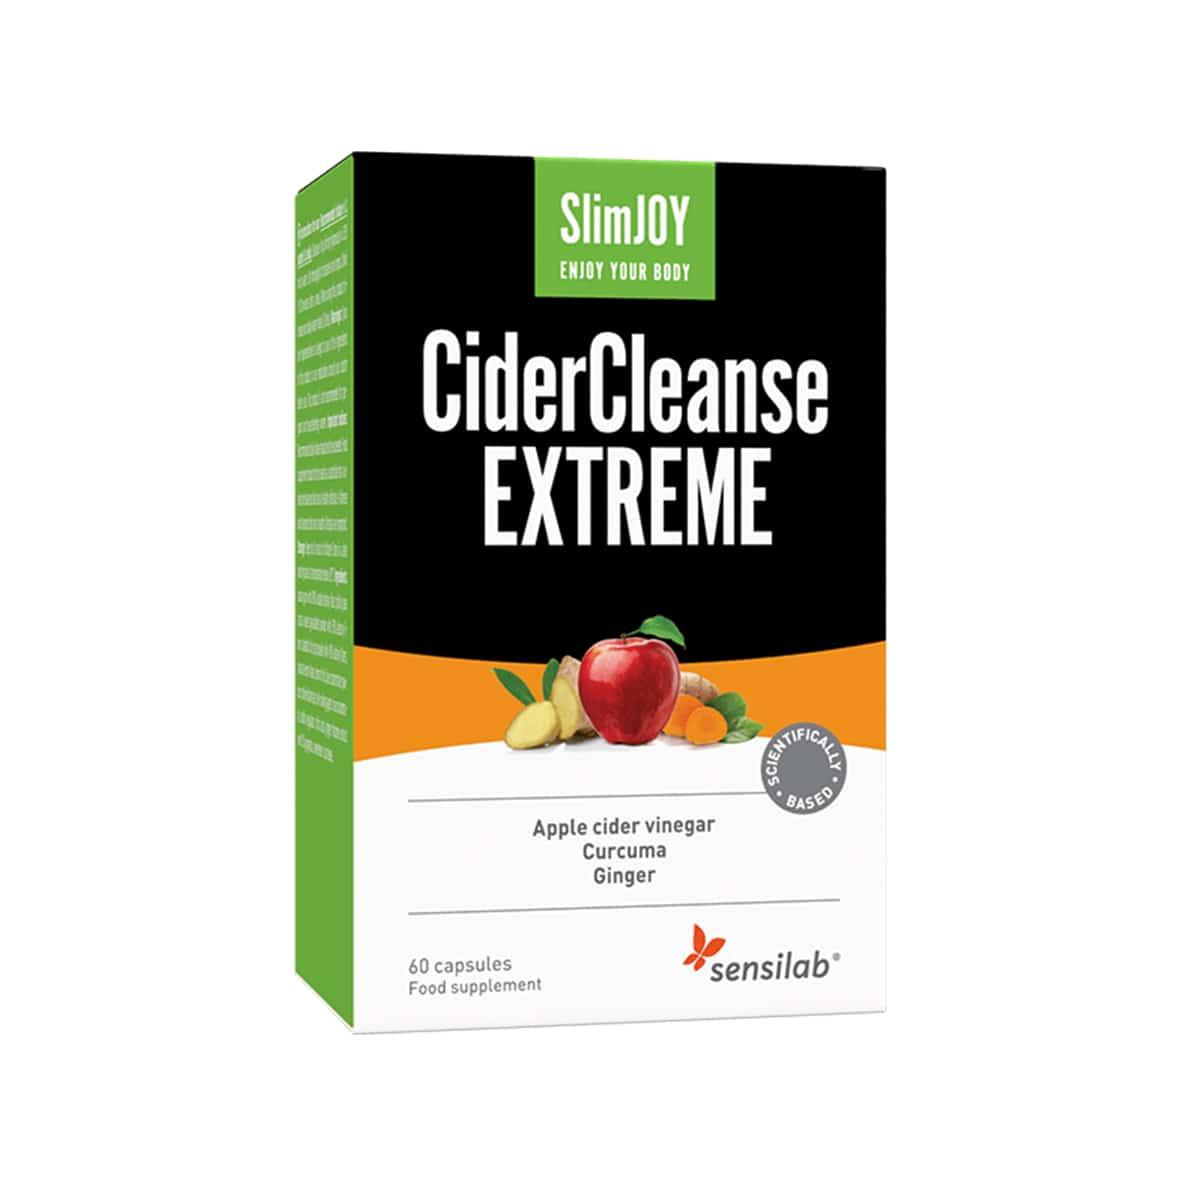 SlimJOY CiderCleanse EXTREME Ireland